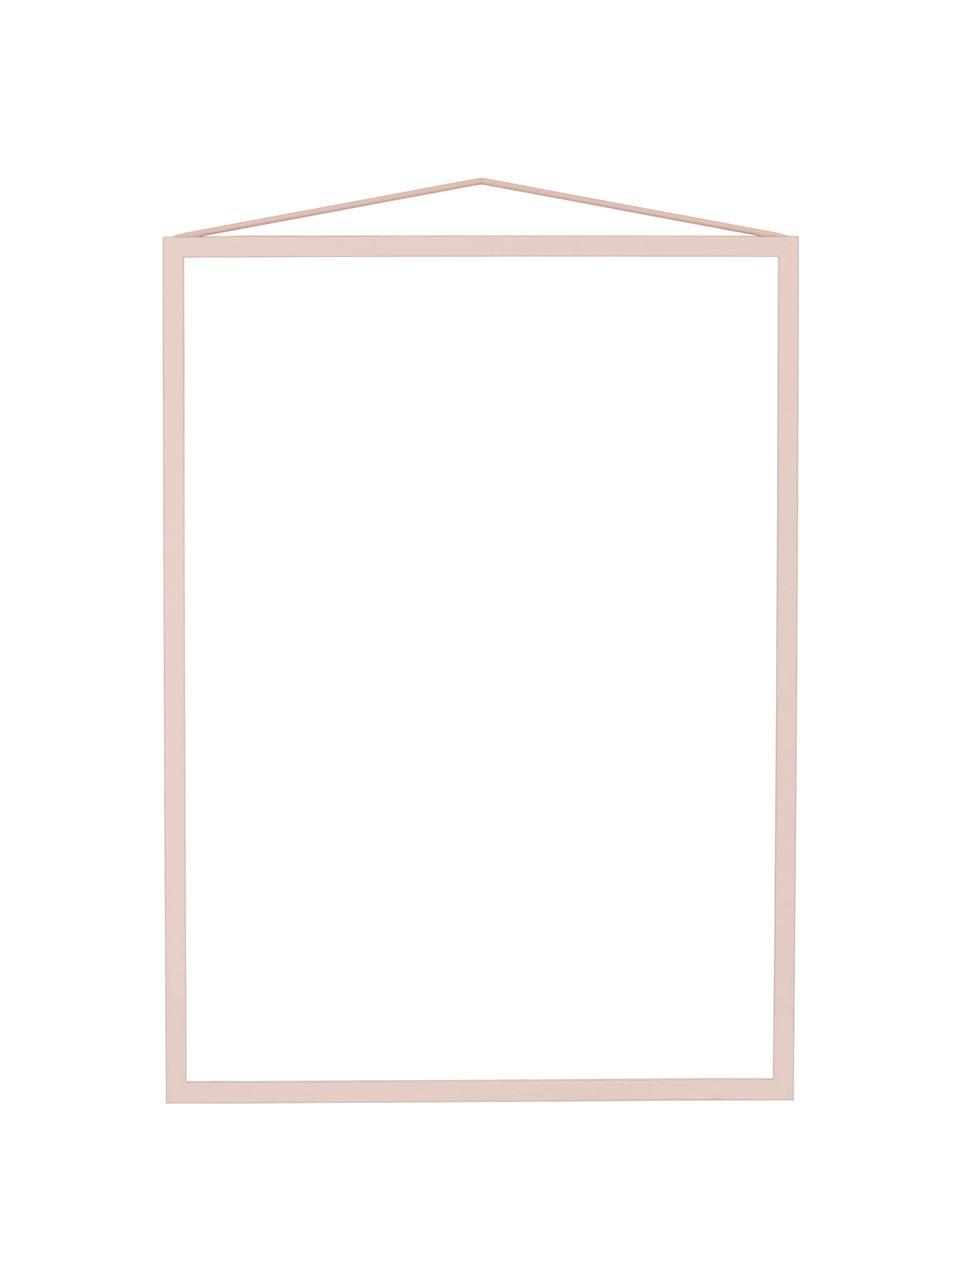 Bilderrahmen Colour Frame, Rahmen: Stahl, pulverbeschichtet, Rosa, 30 x 42 cm